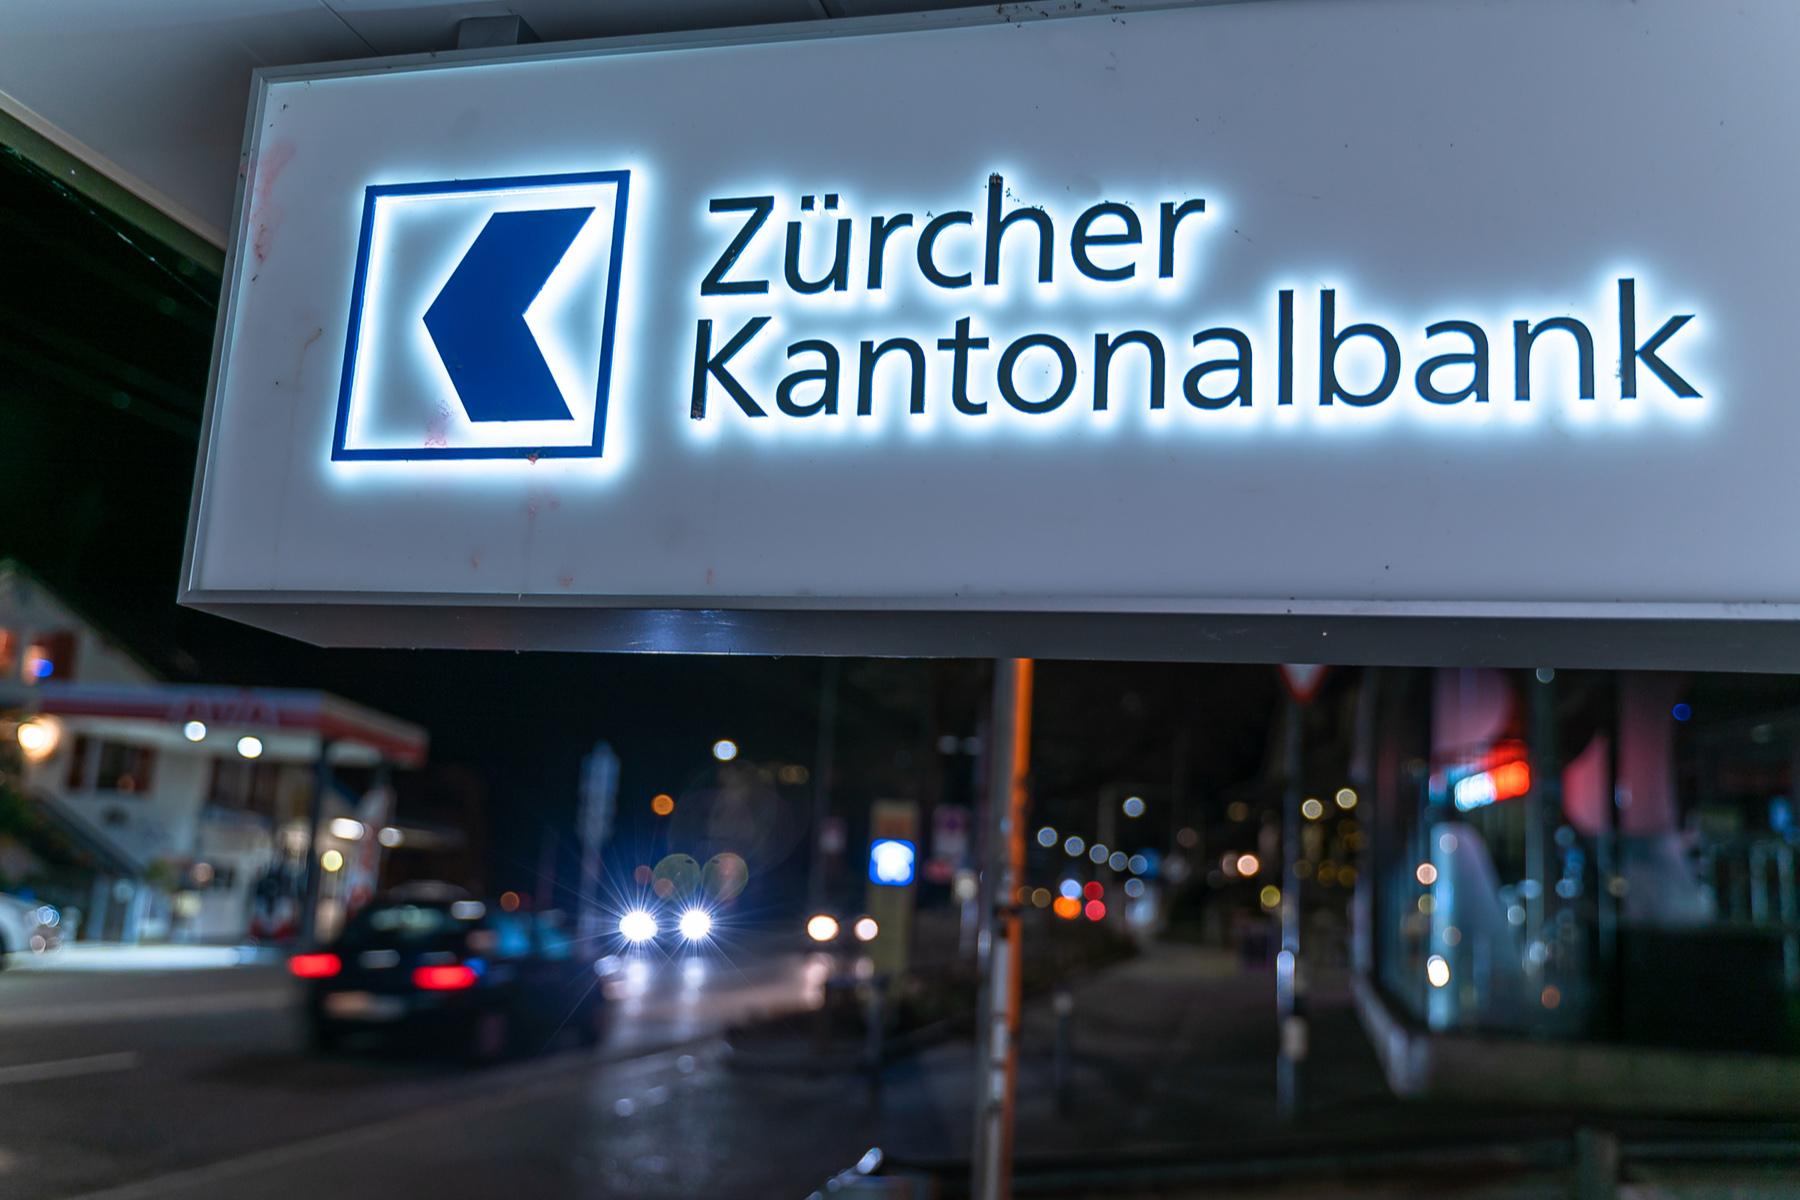 Zürcher Kantonalbank sign